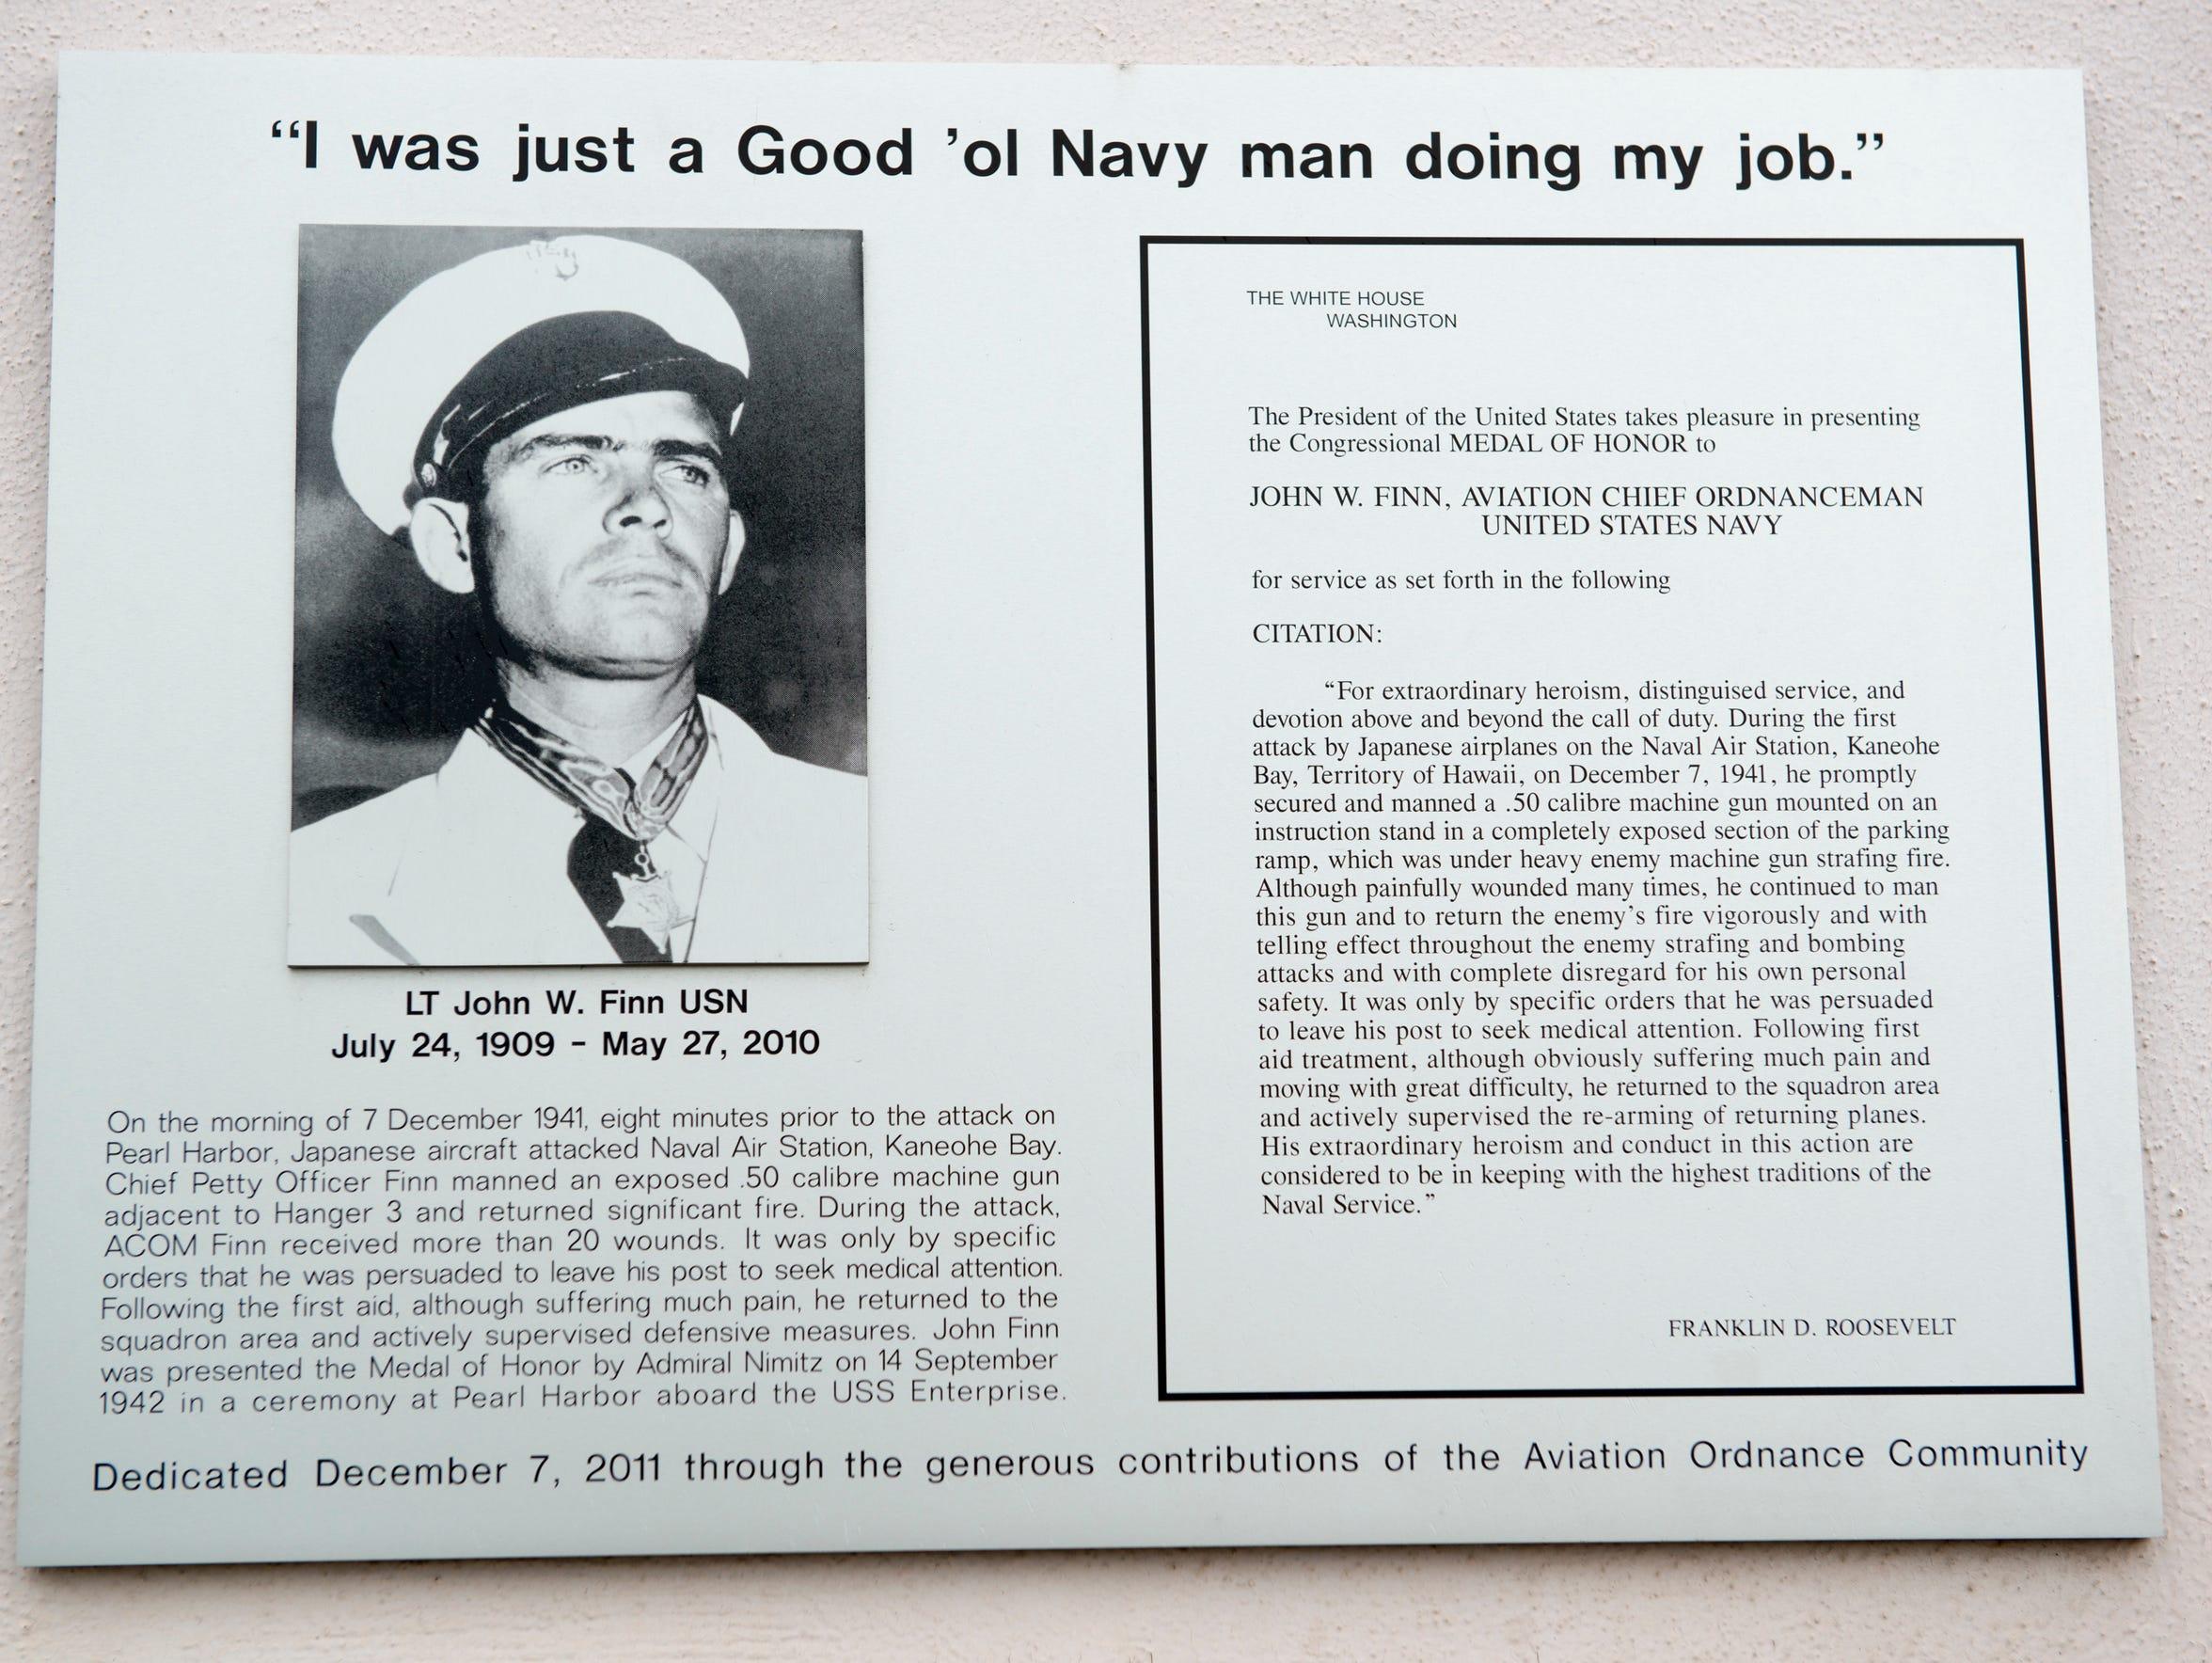 A monument to U.S. Navy Lieutenant John W. Finn, whose